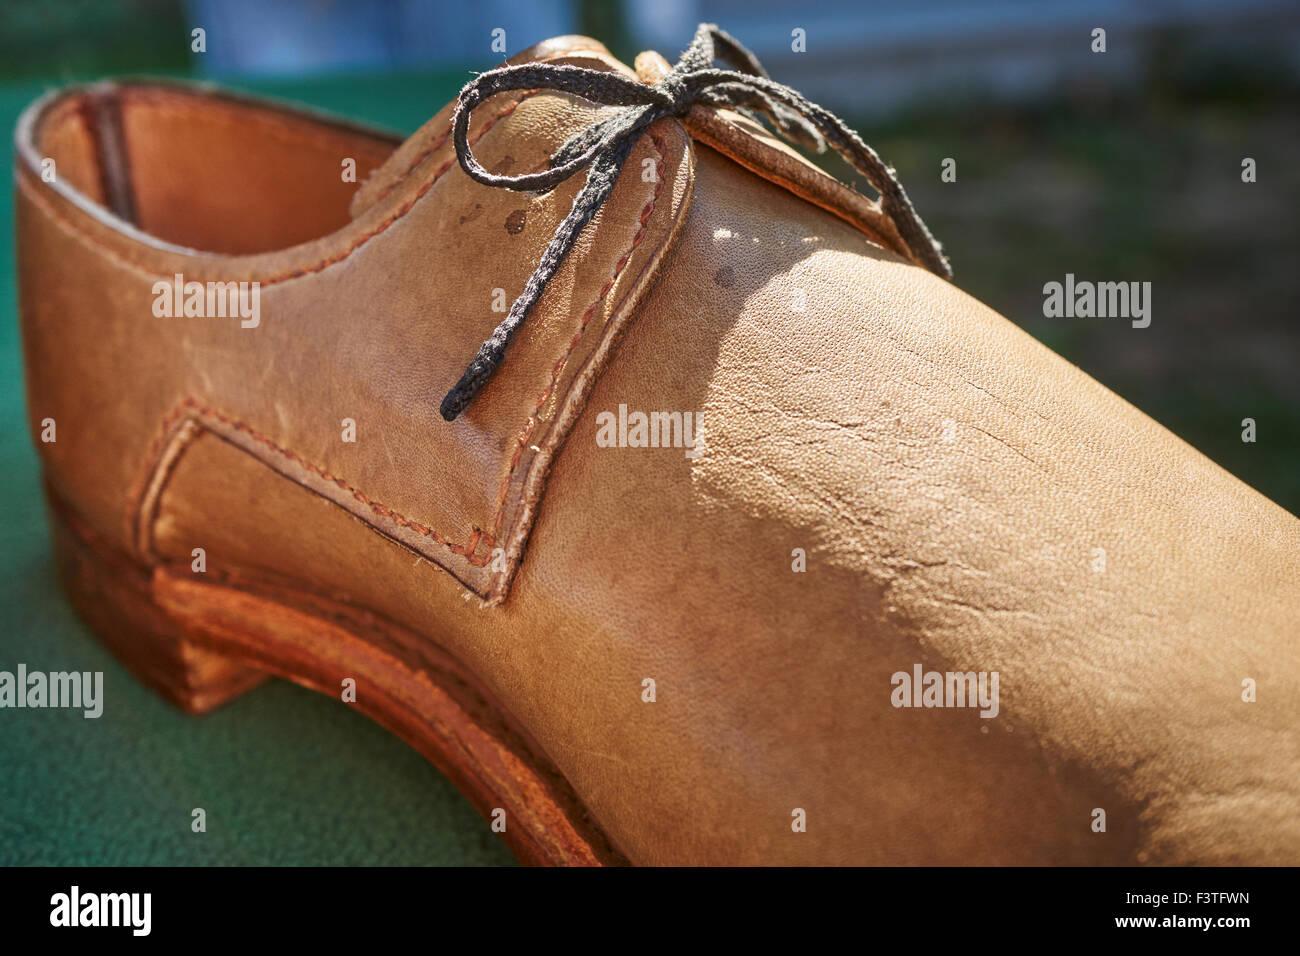 8f3c75aee79e Historic Shoe Stockfotos   Historic Shoe Bilder - Alamy